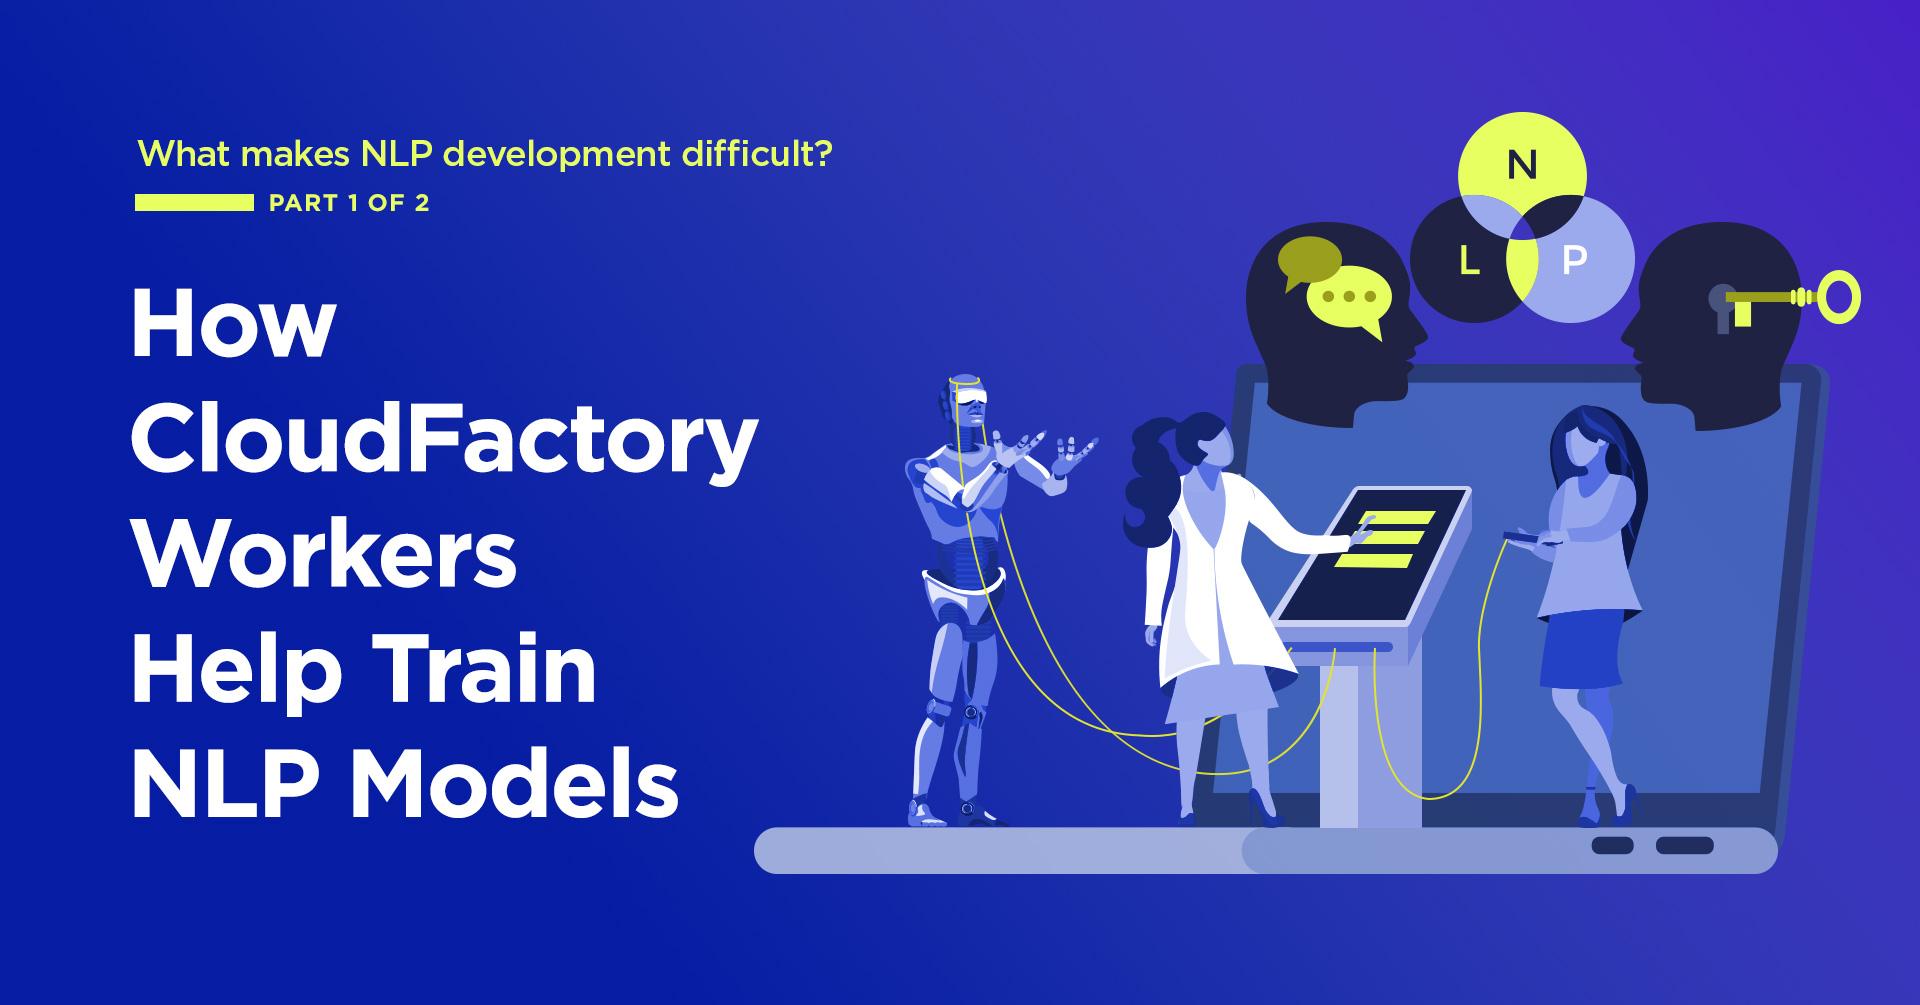 How CloudFactory Workers Help Train NLP Models